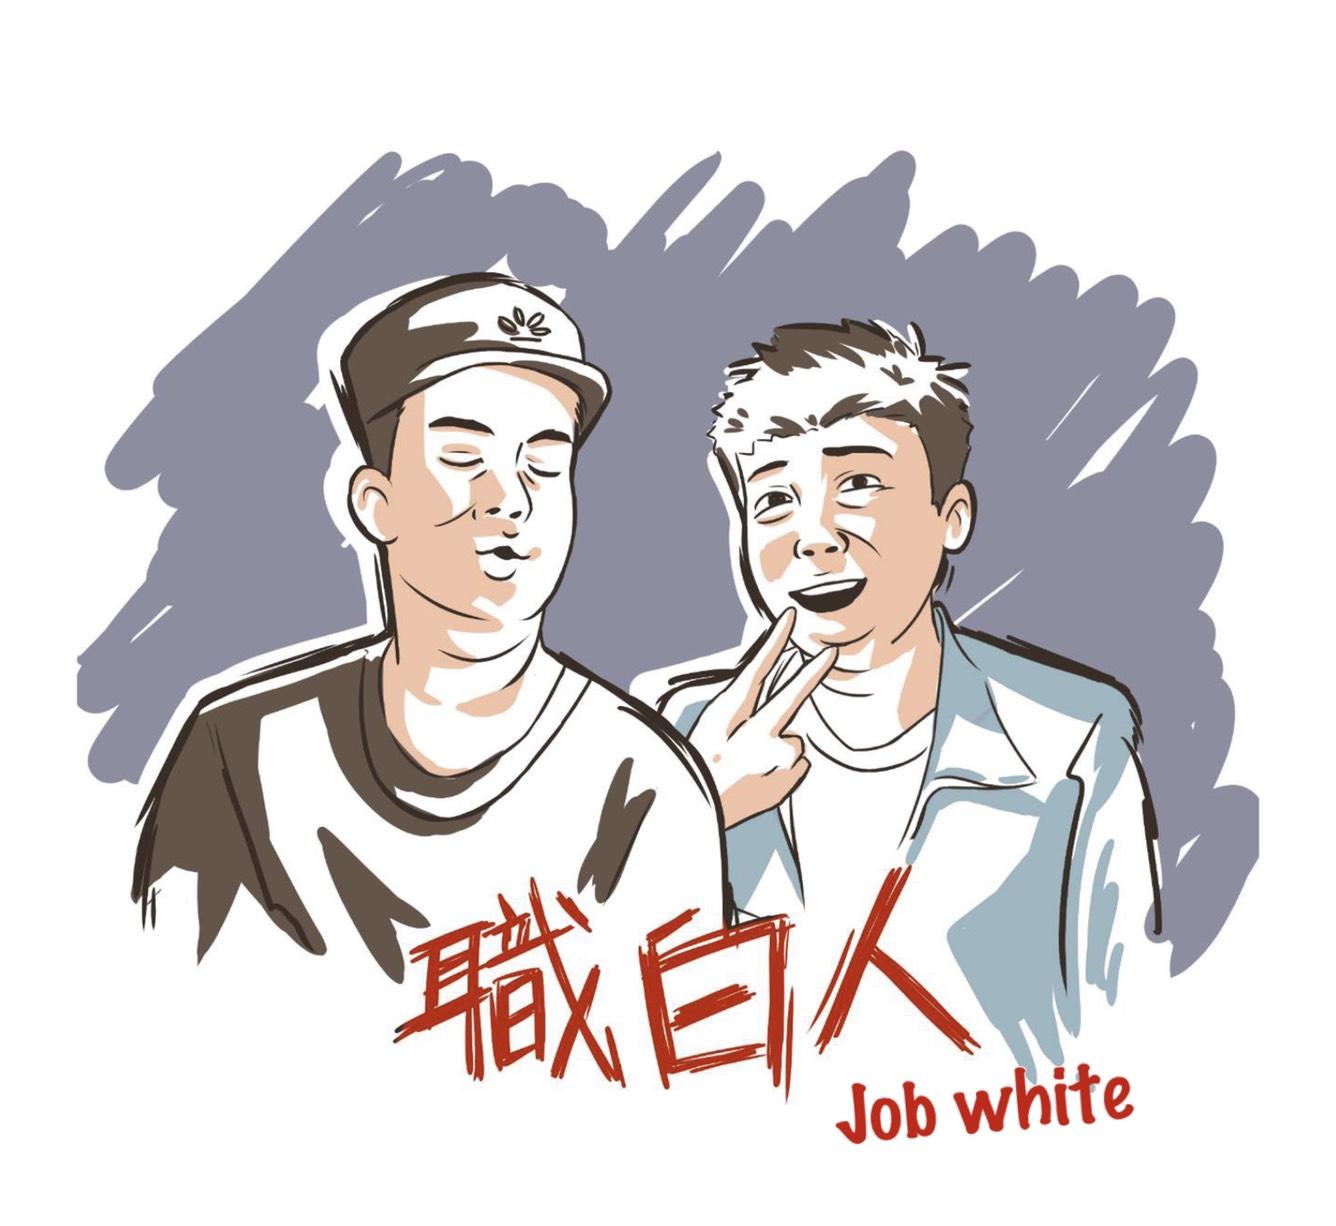 EP11 吃貨擔任美食節目企劃   ft.讚讚【Job white 職白人】